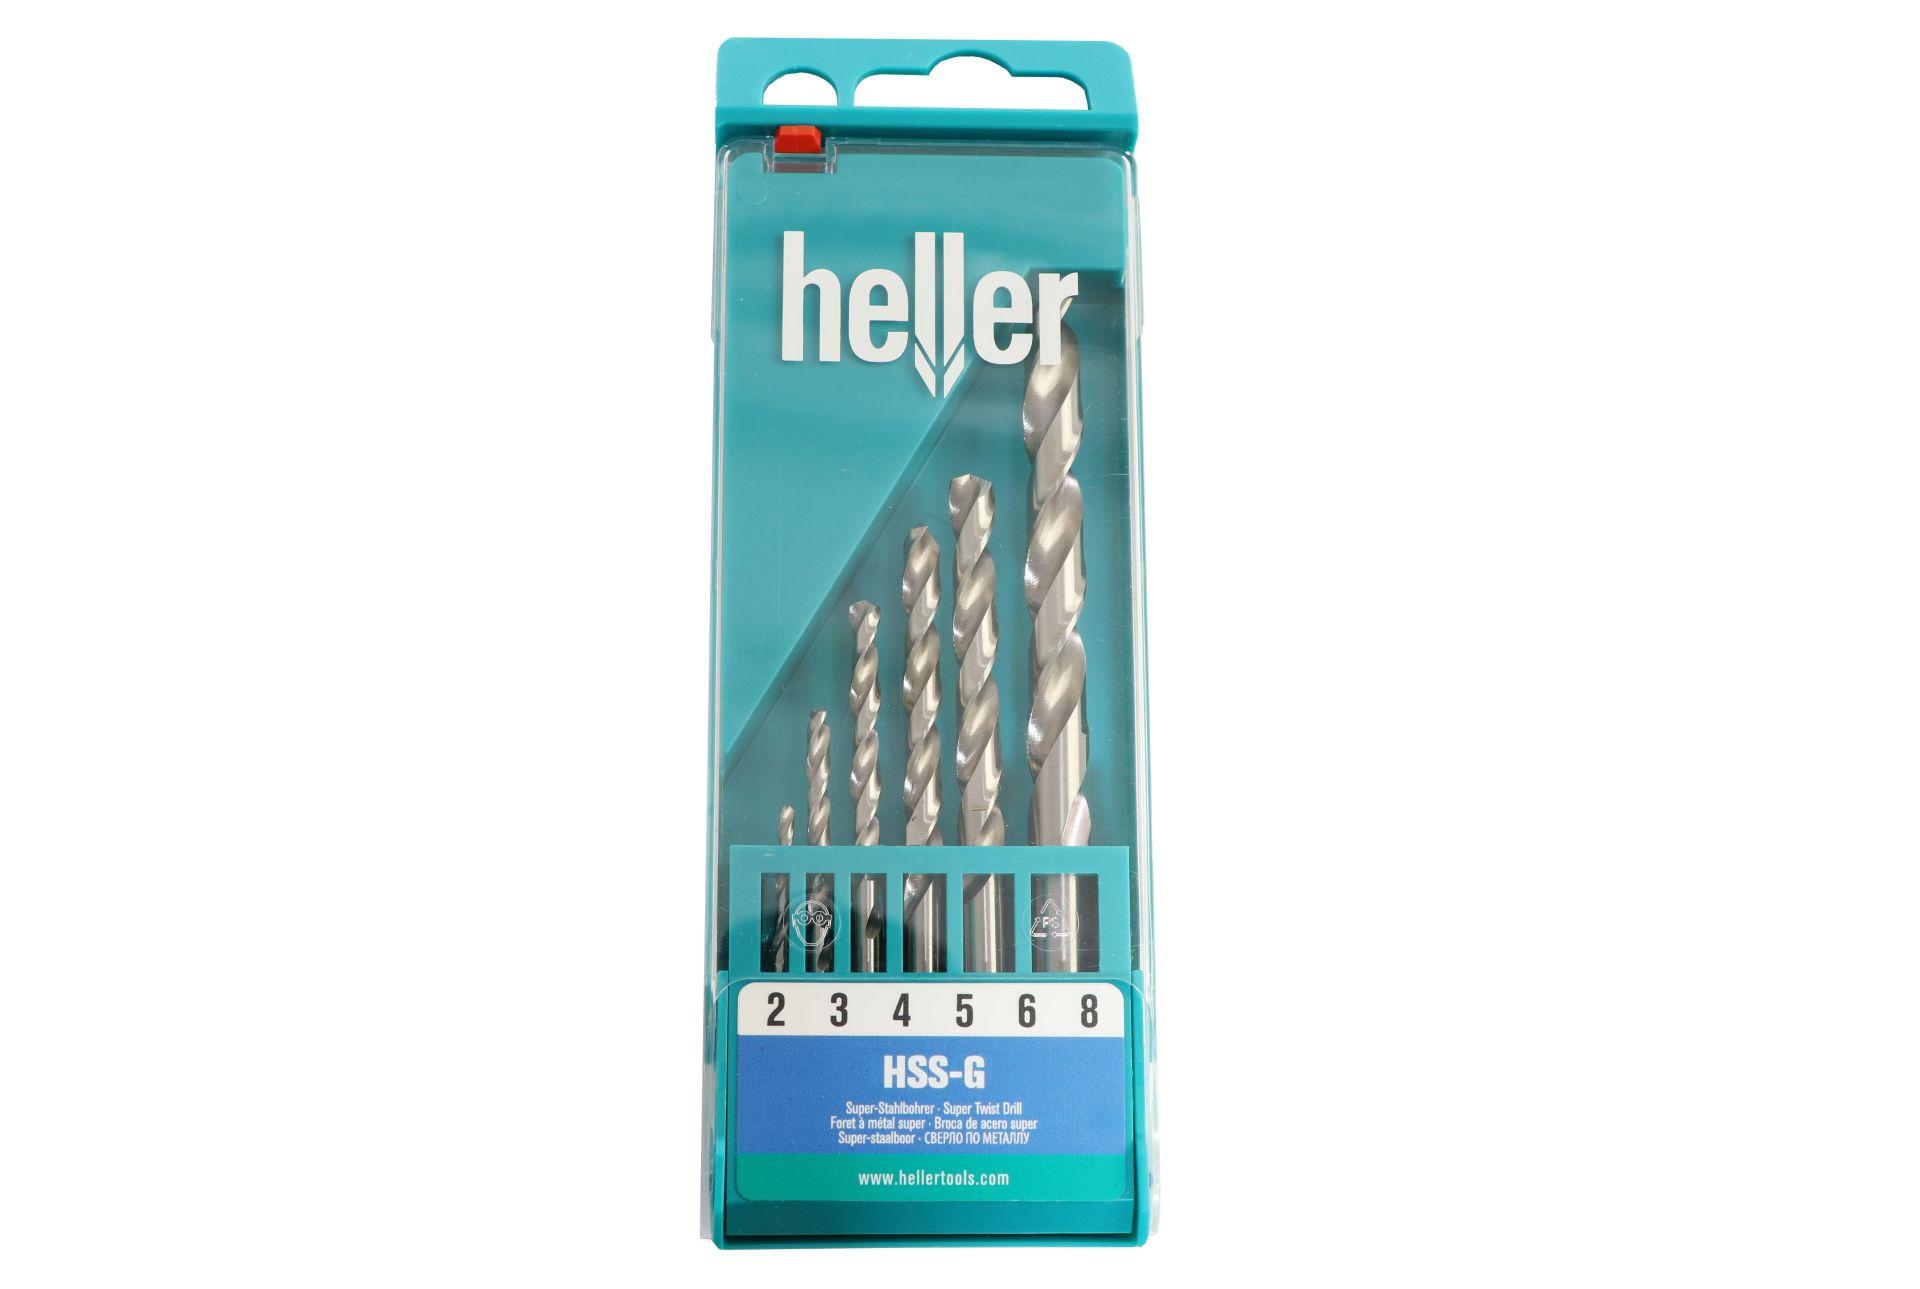 heller Super-Stahlbohrer-Set, Serie 'HSS-G', 6-teilig, Ø 2/3/4/5/6/8 mm